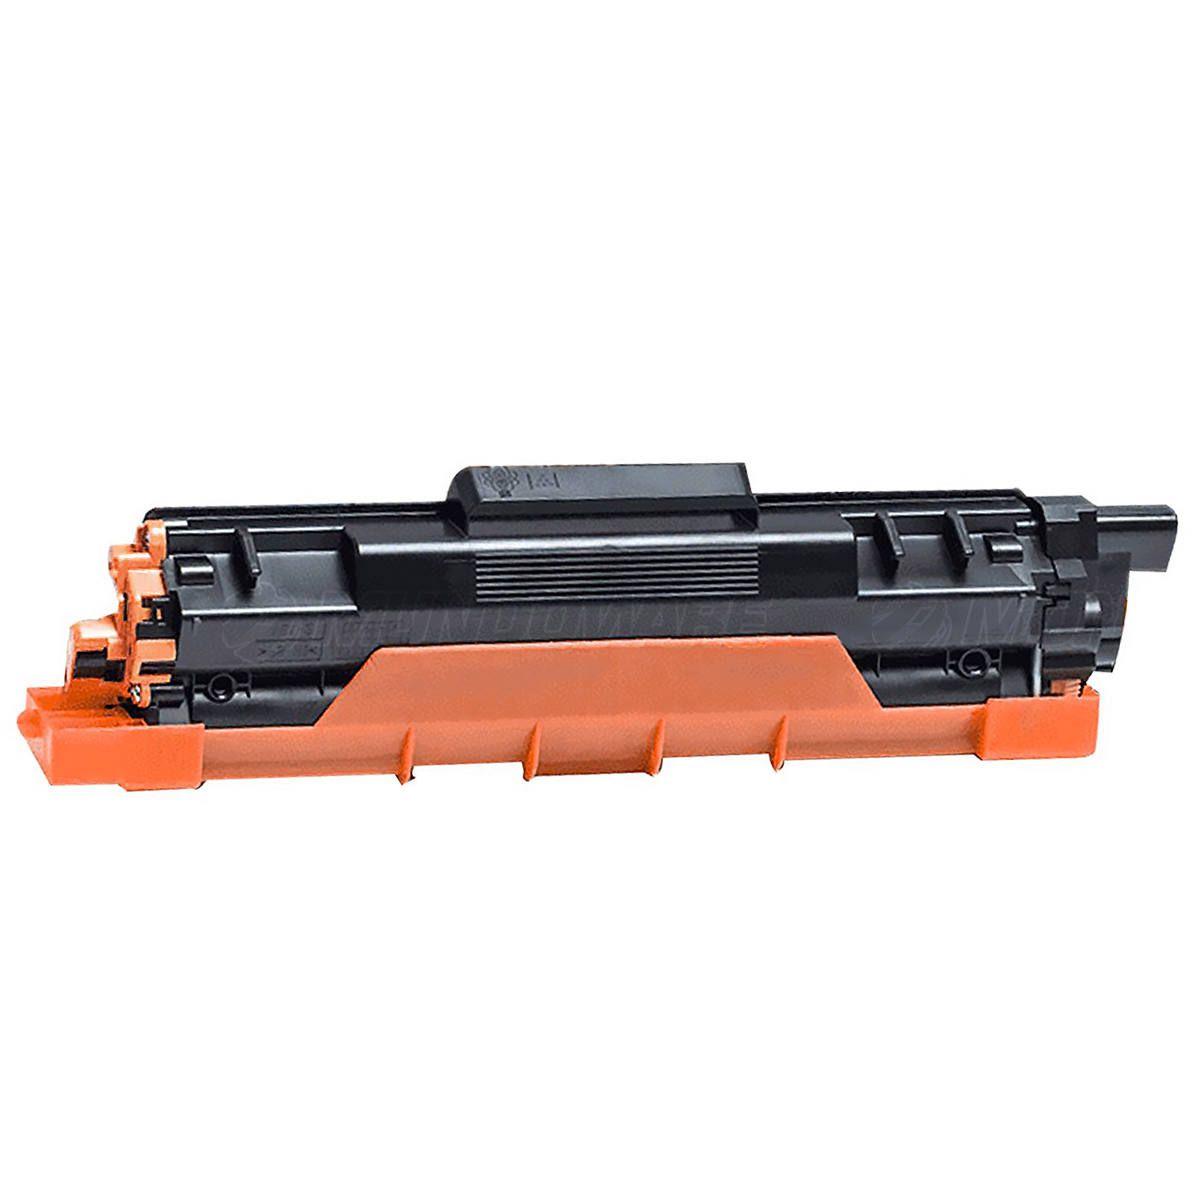 Compatível: Kit Colorido de Toner TN217 TN213 para Brother L3230cdw L3510cdw L3550cdw L3730cdw L3750cdw L3745cdw L3770